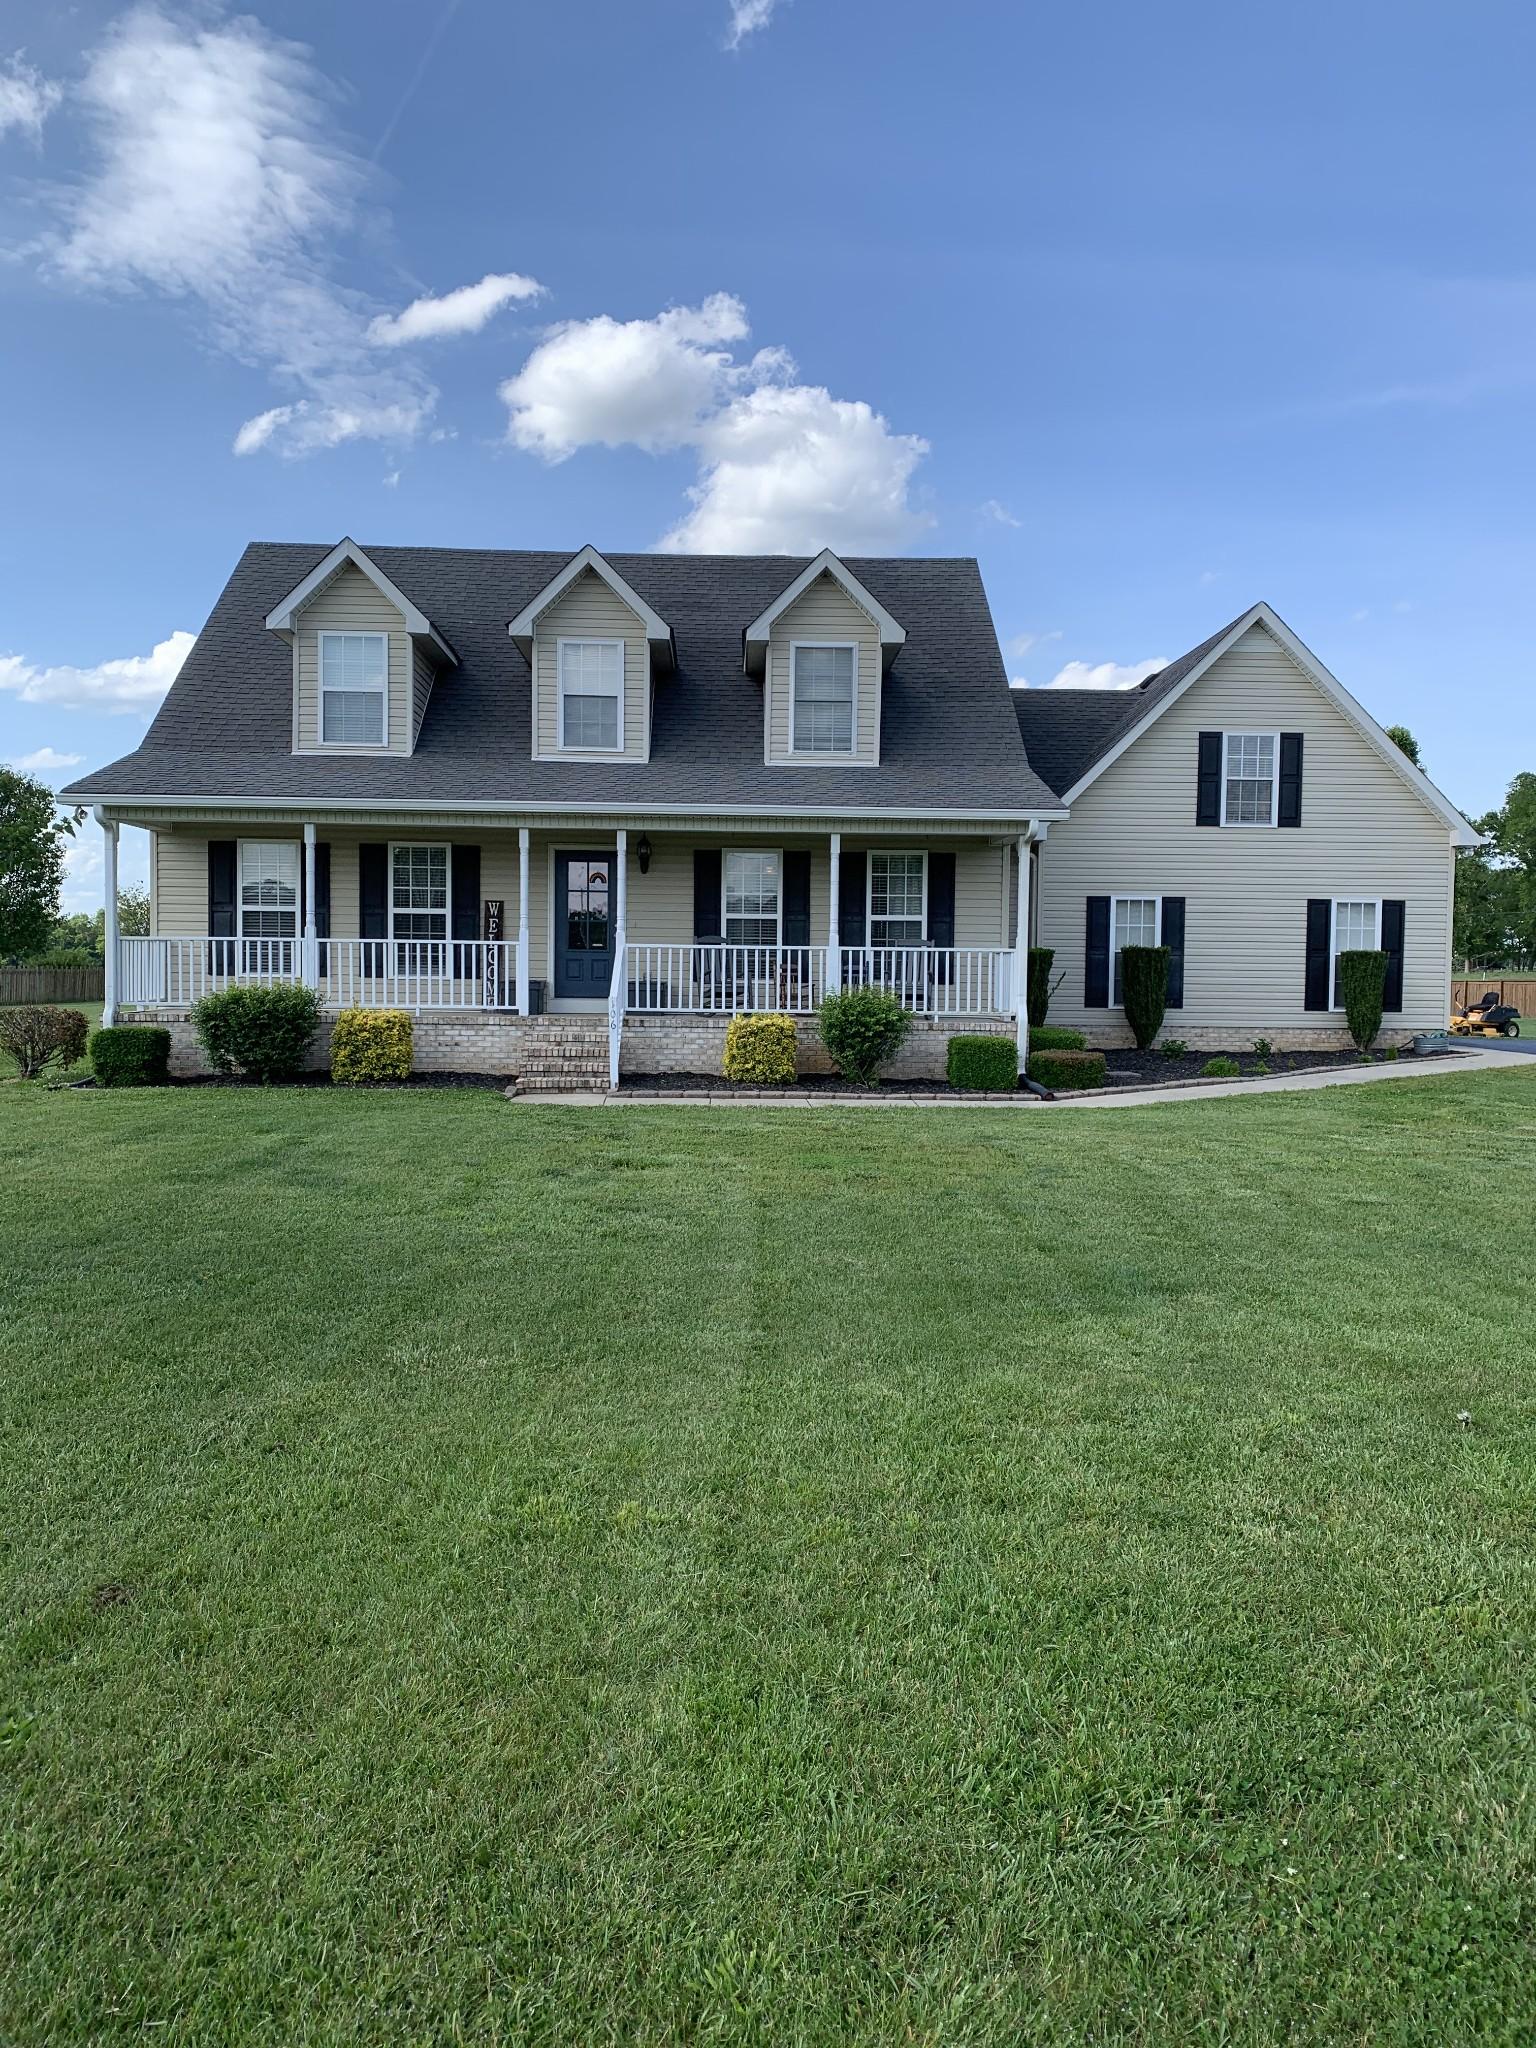 106 Hazelnut Ln, Unionville, TN 37180 - Unionville, TN real estate listing